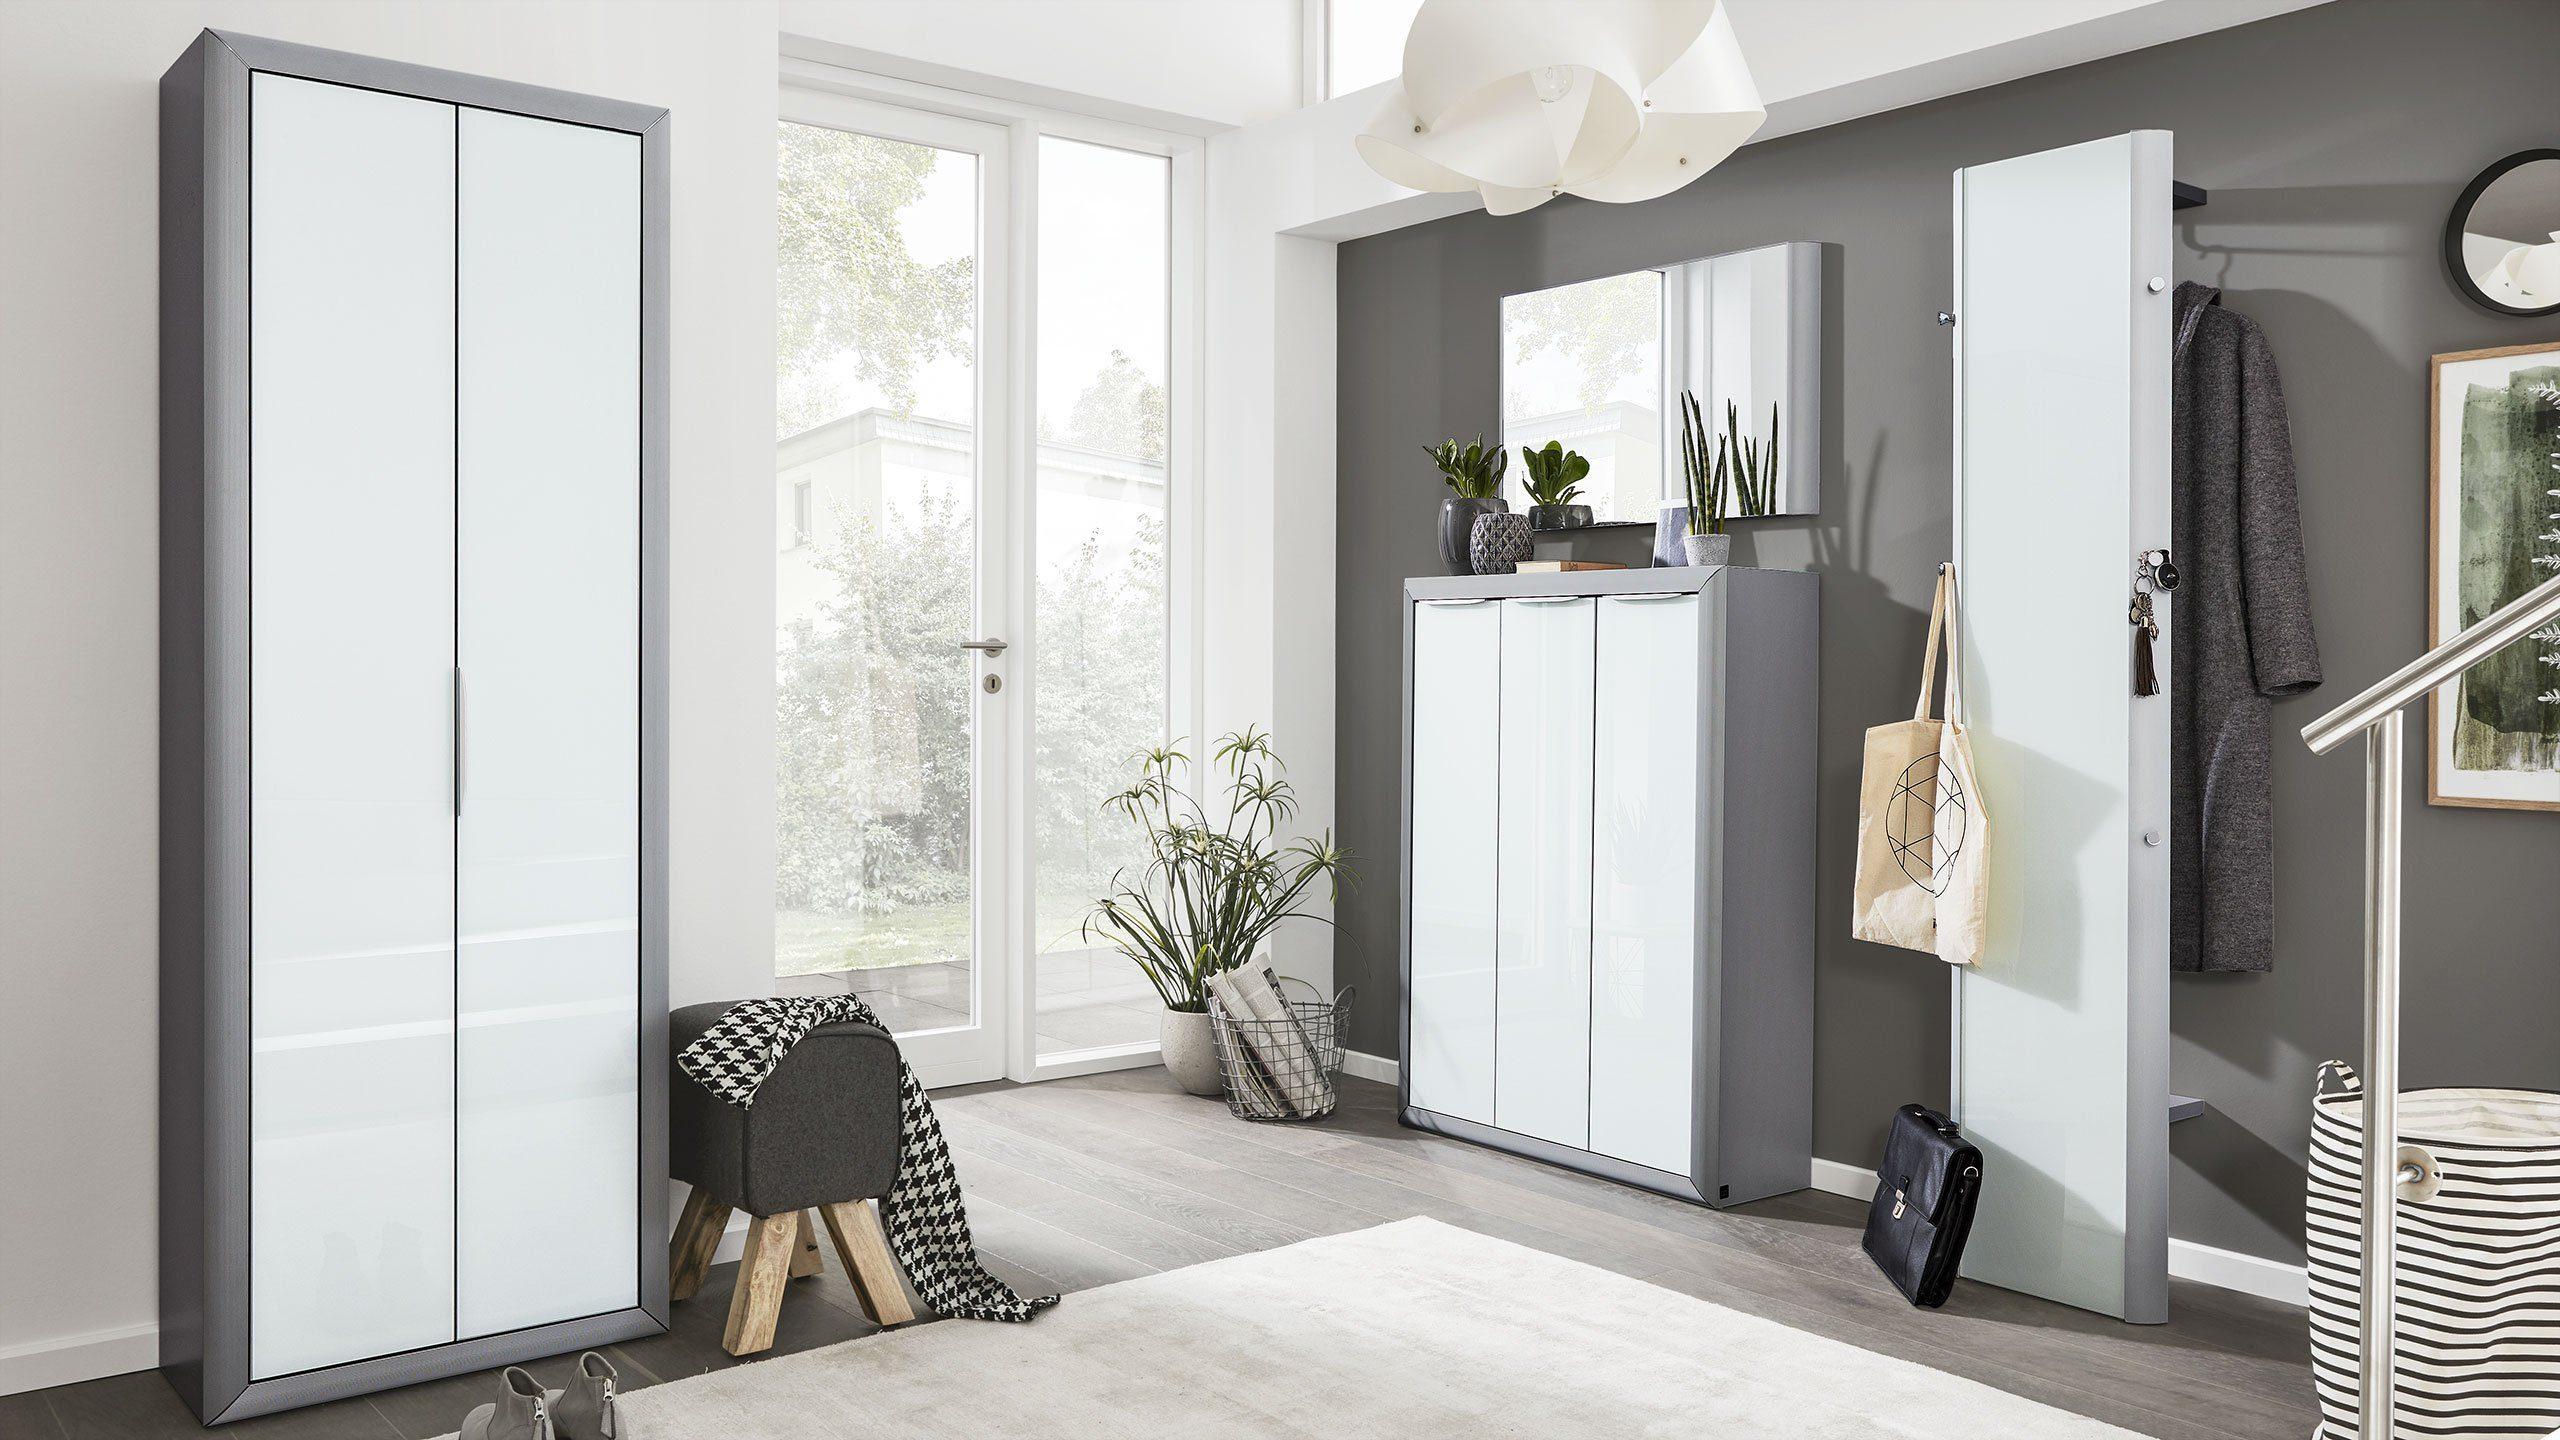 kleiner flur ideen flur tapeten ideen telegr me. Black Bedroom Furniture Sets. Home Design Ideas